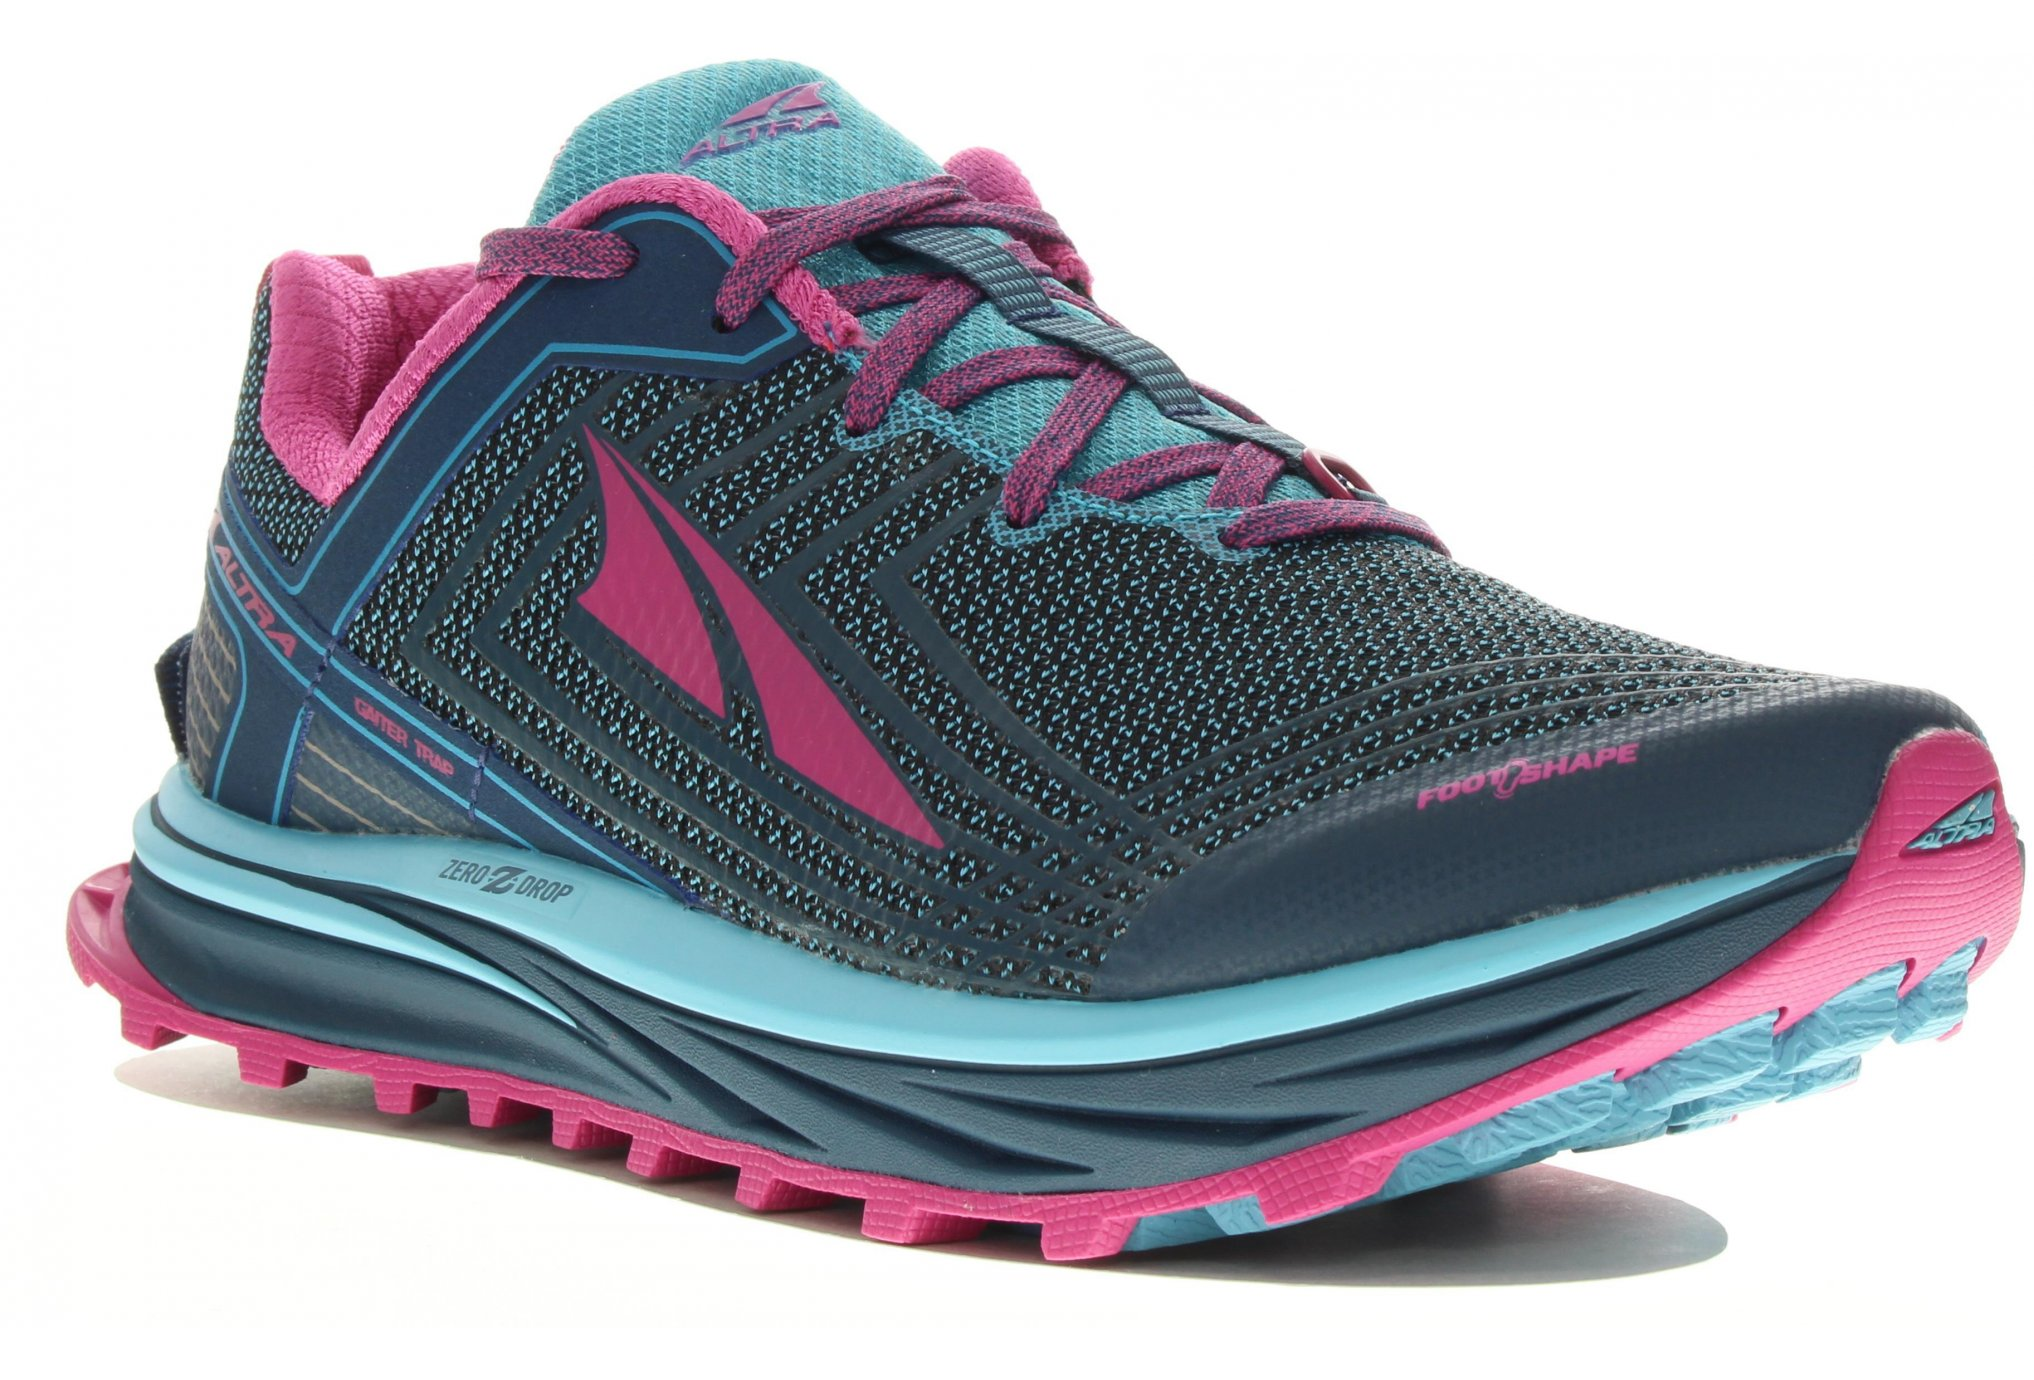 De Mujer Altra Running Baratas Outlet Zapatillas QxrBsdCht